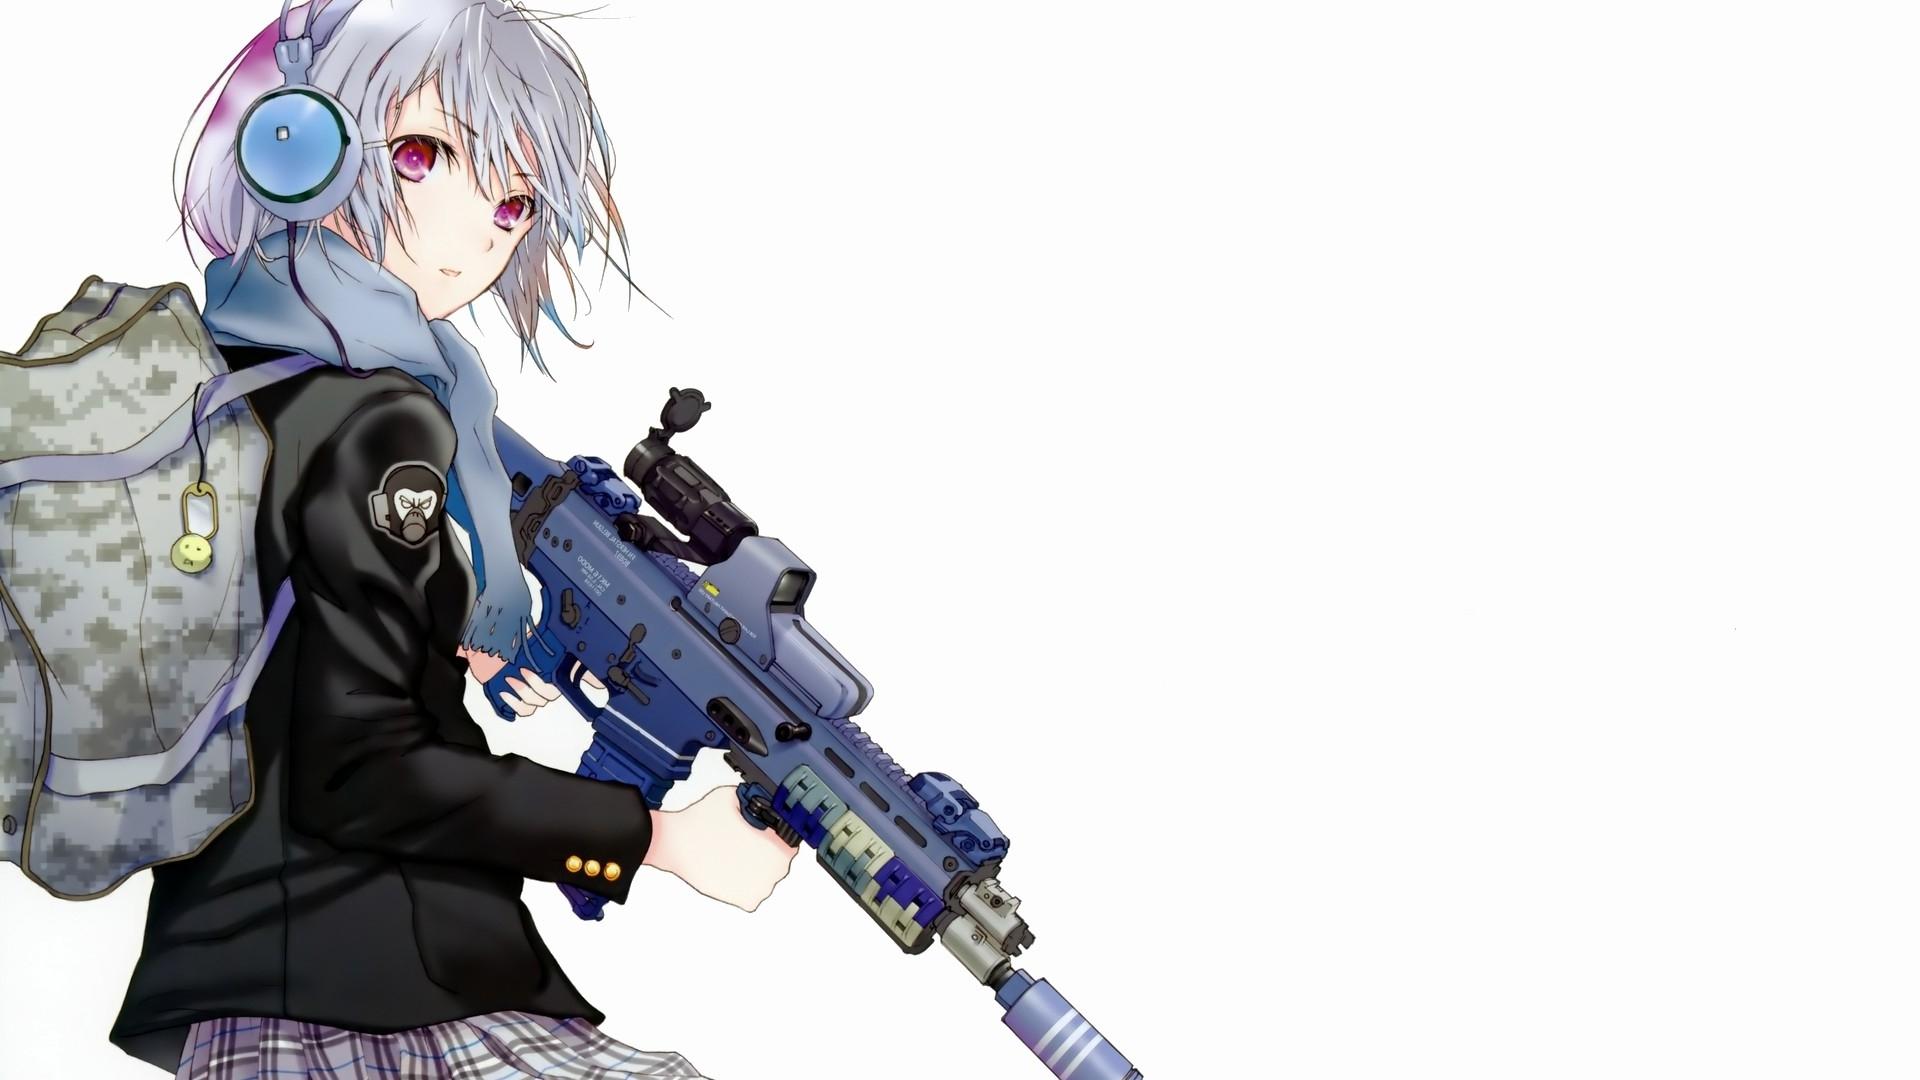 Sniper Anime Girl 1920x1080